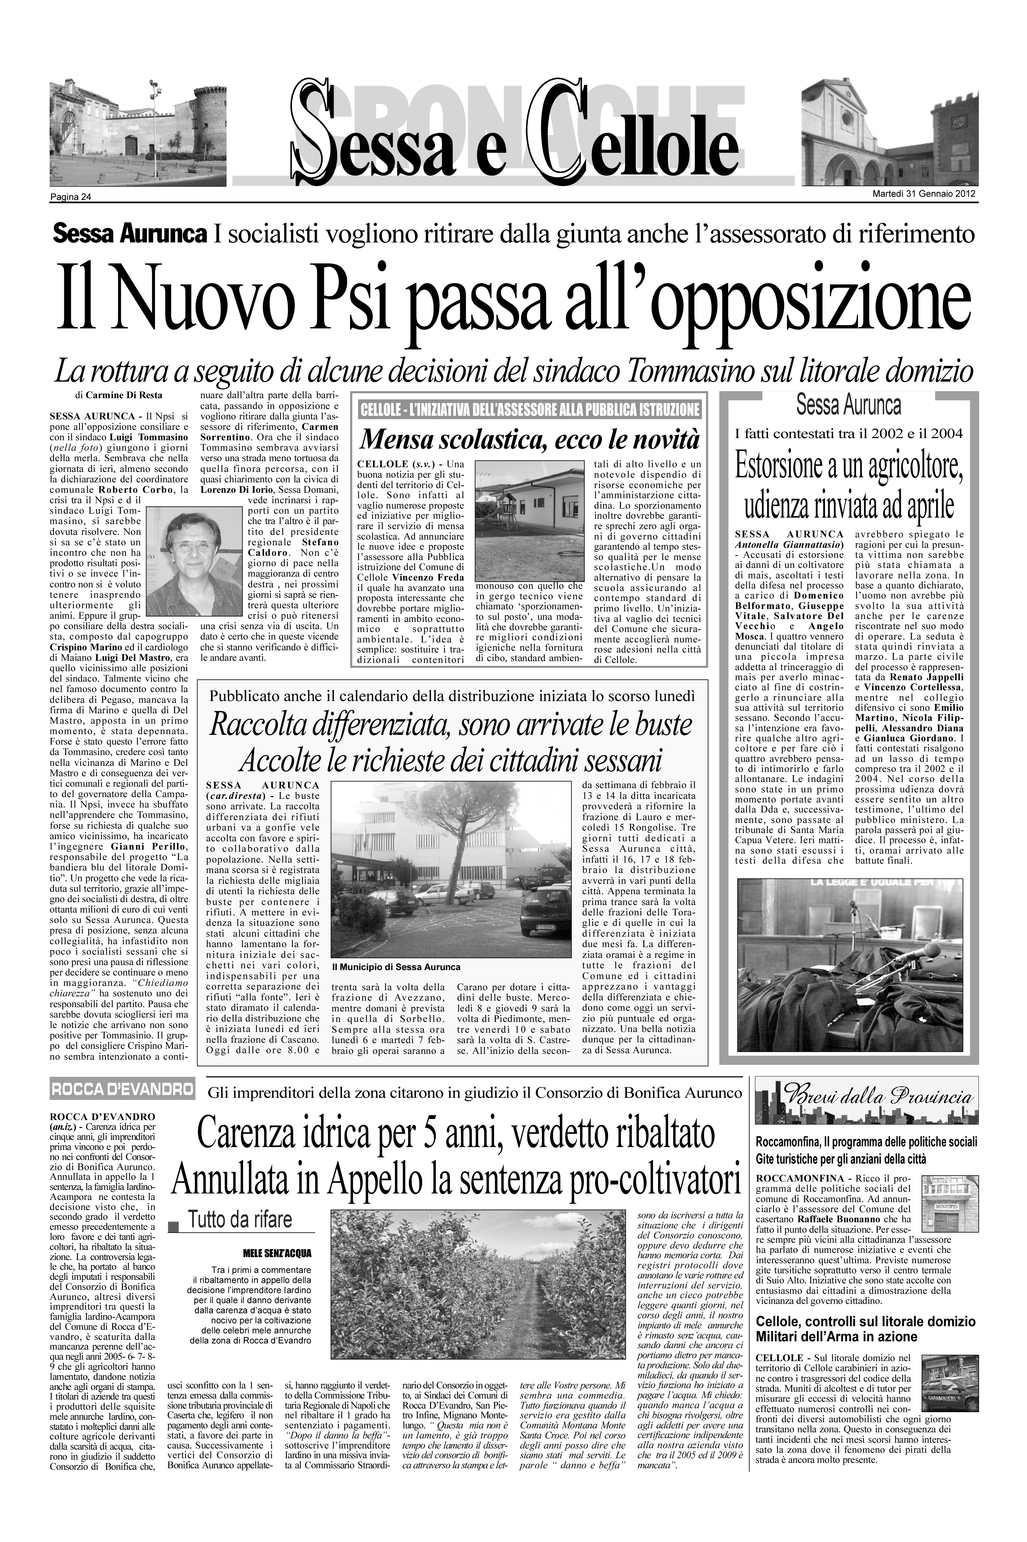 Smaltimento Rifiuti Sessa Aurunca calaméo - giornali genn aio 2012